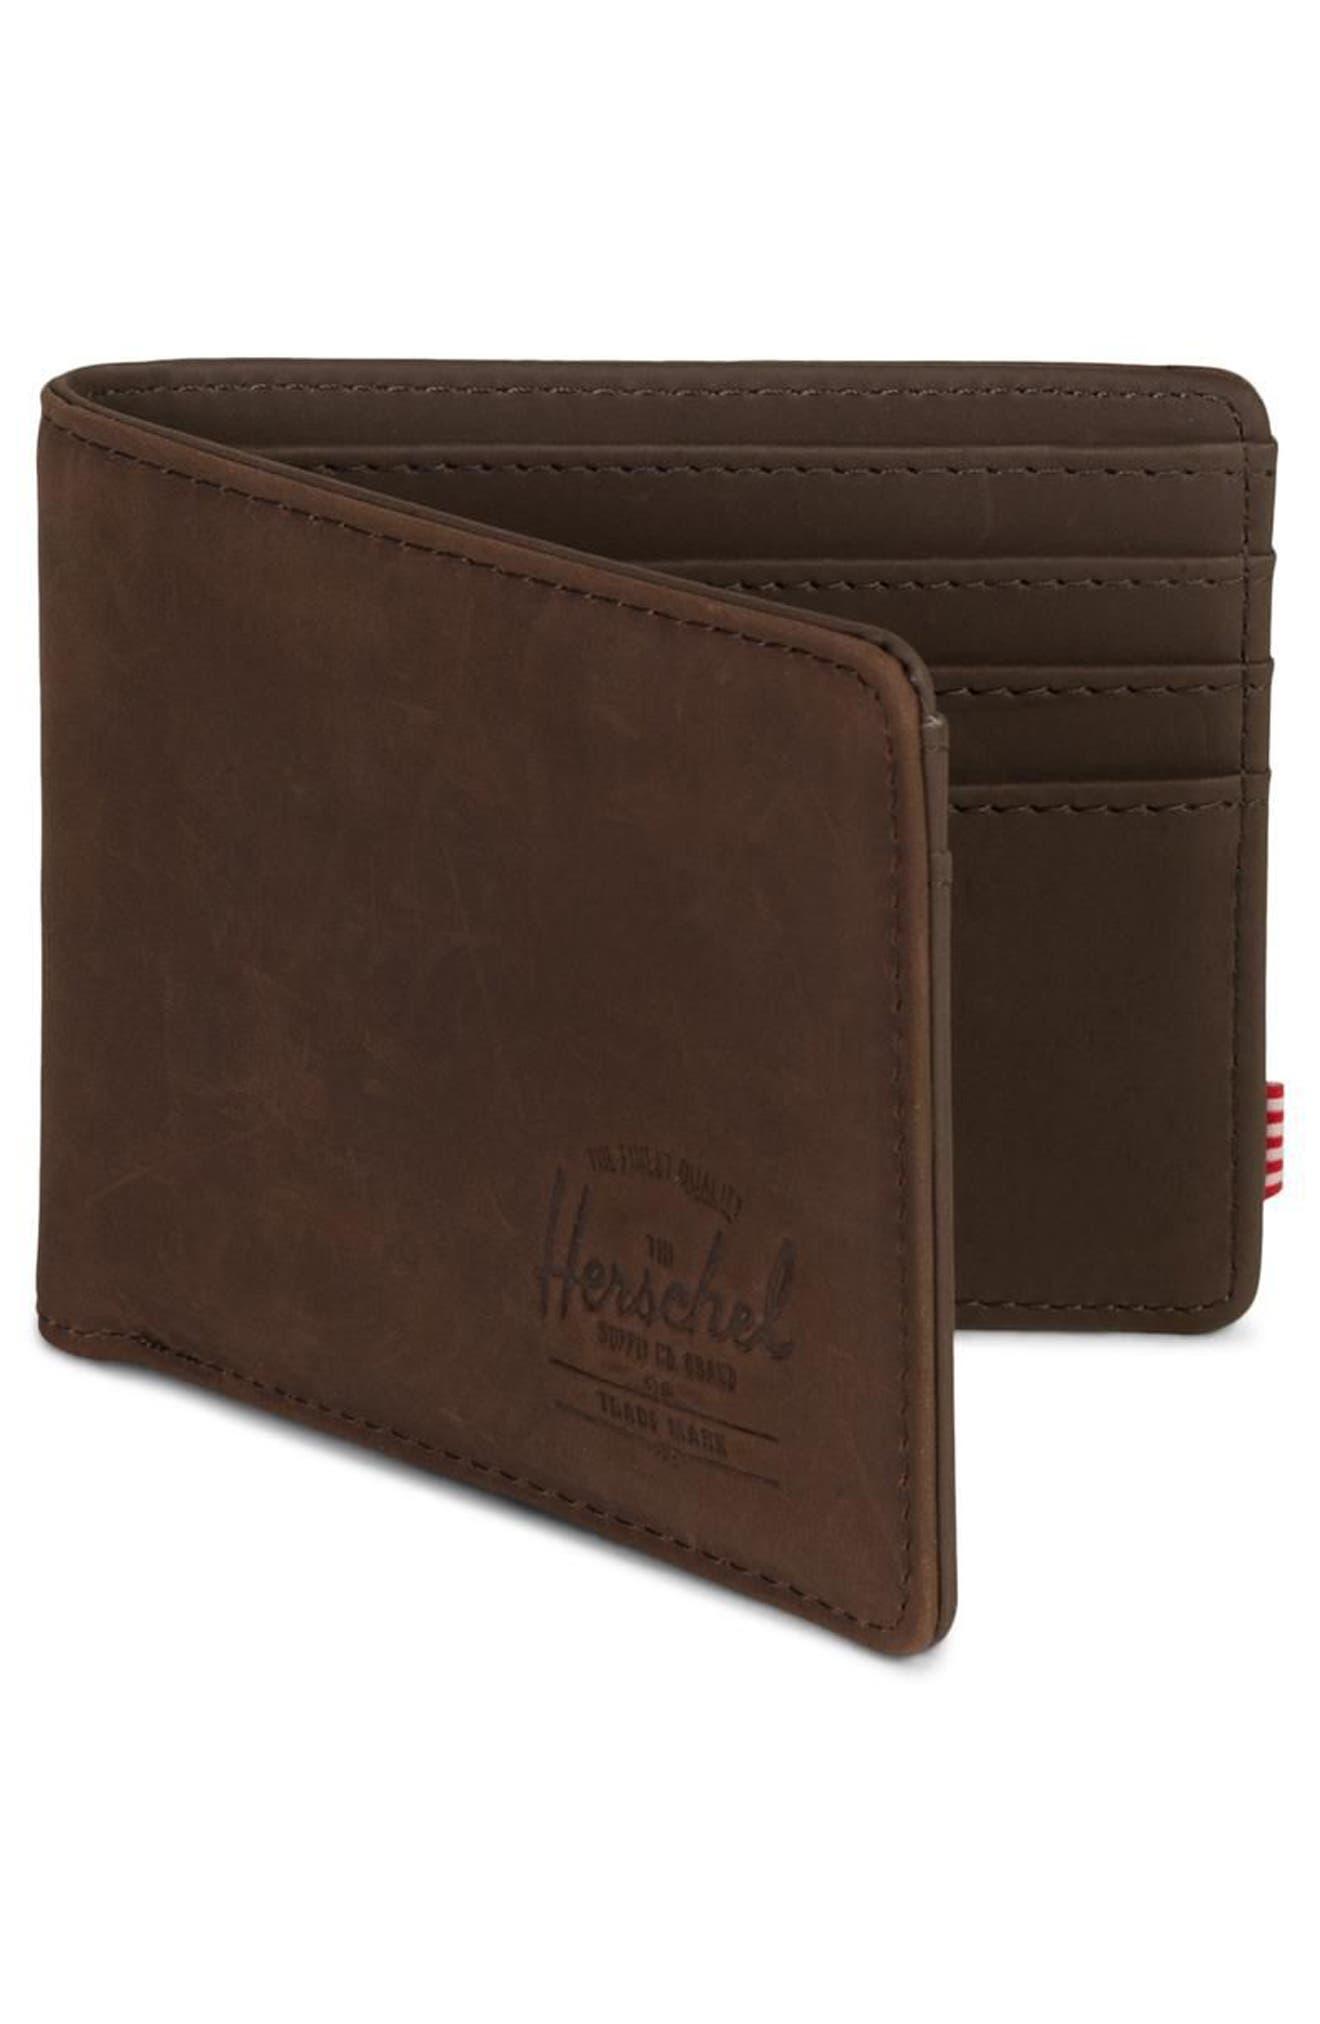 Hank Leather Wallet,                             Alternate thumbnail 3, color,                             NUBUCK BROWN